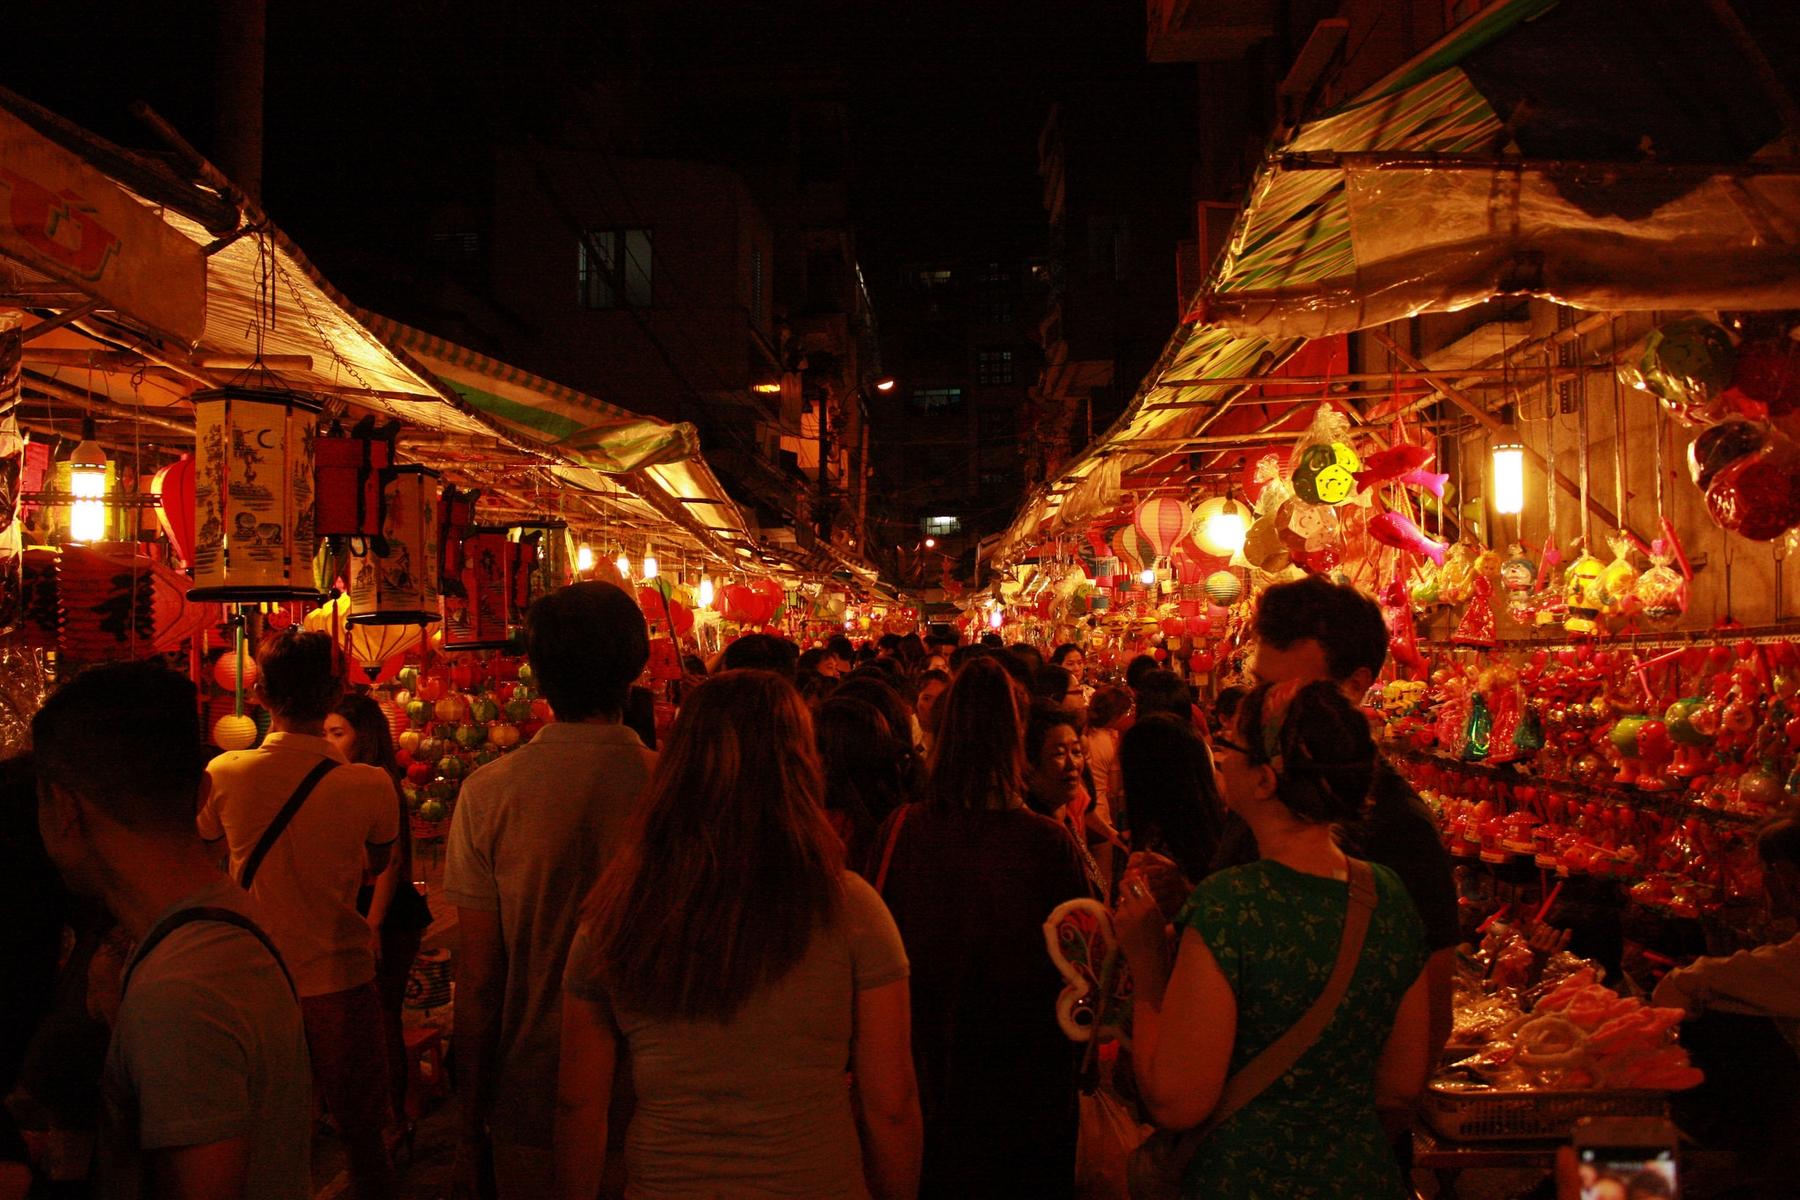 destinos baratos para nomadas digitales vietnam